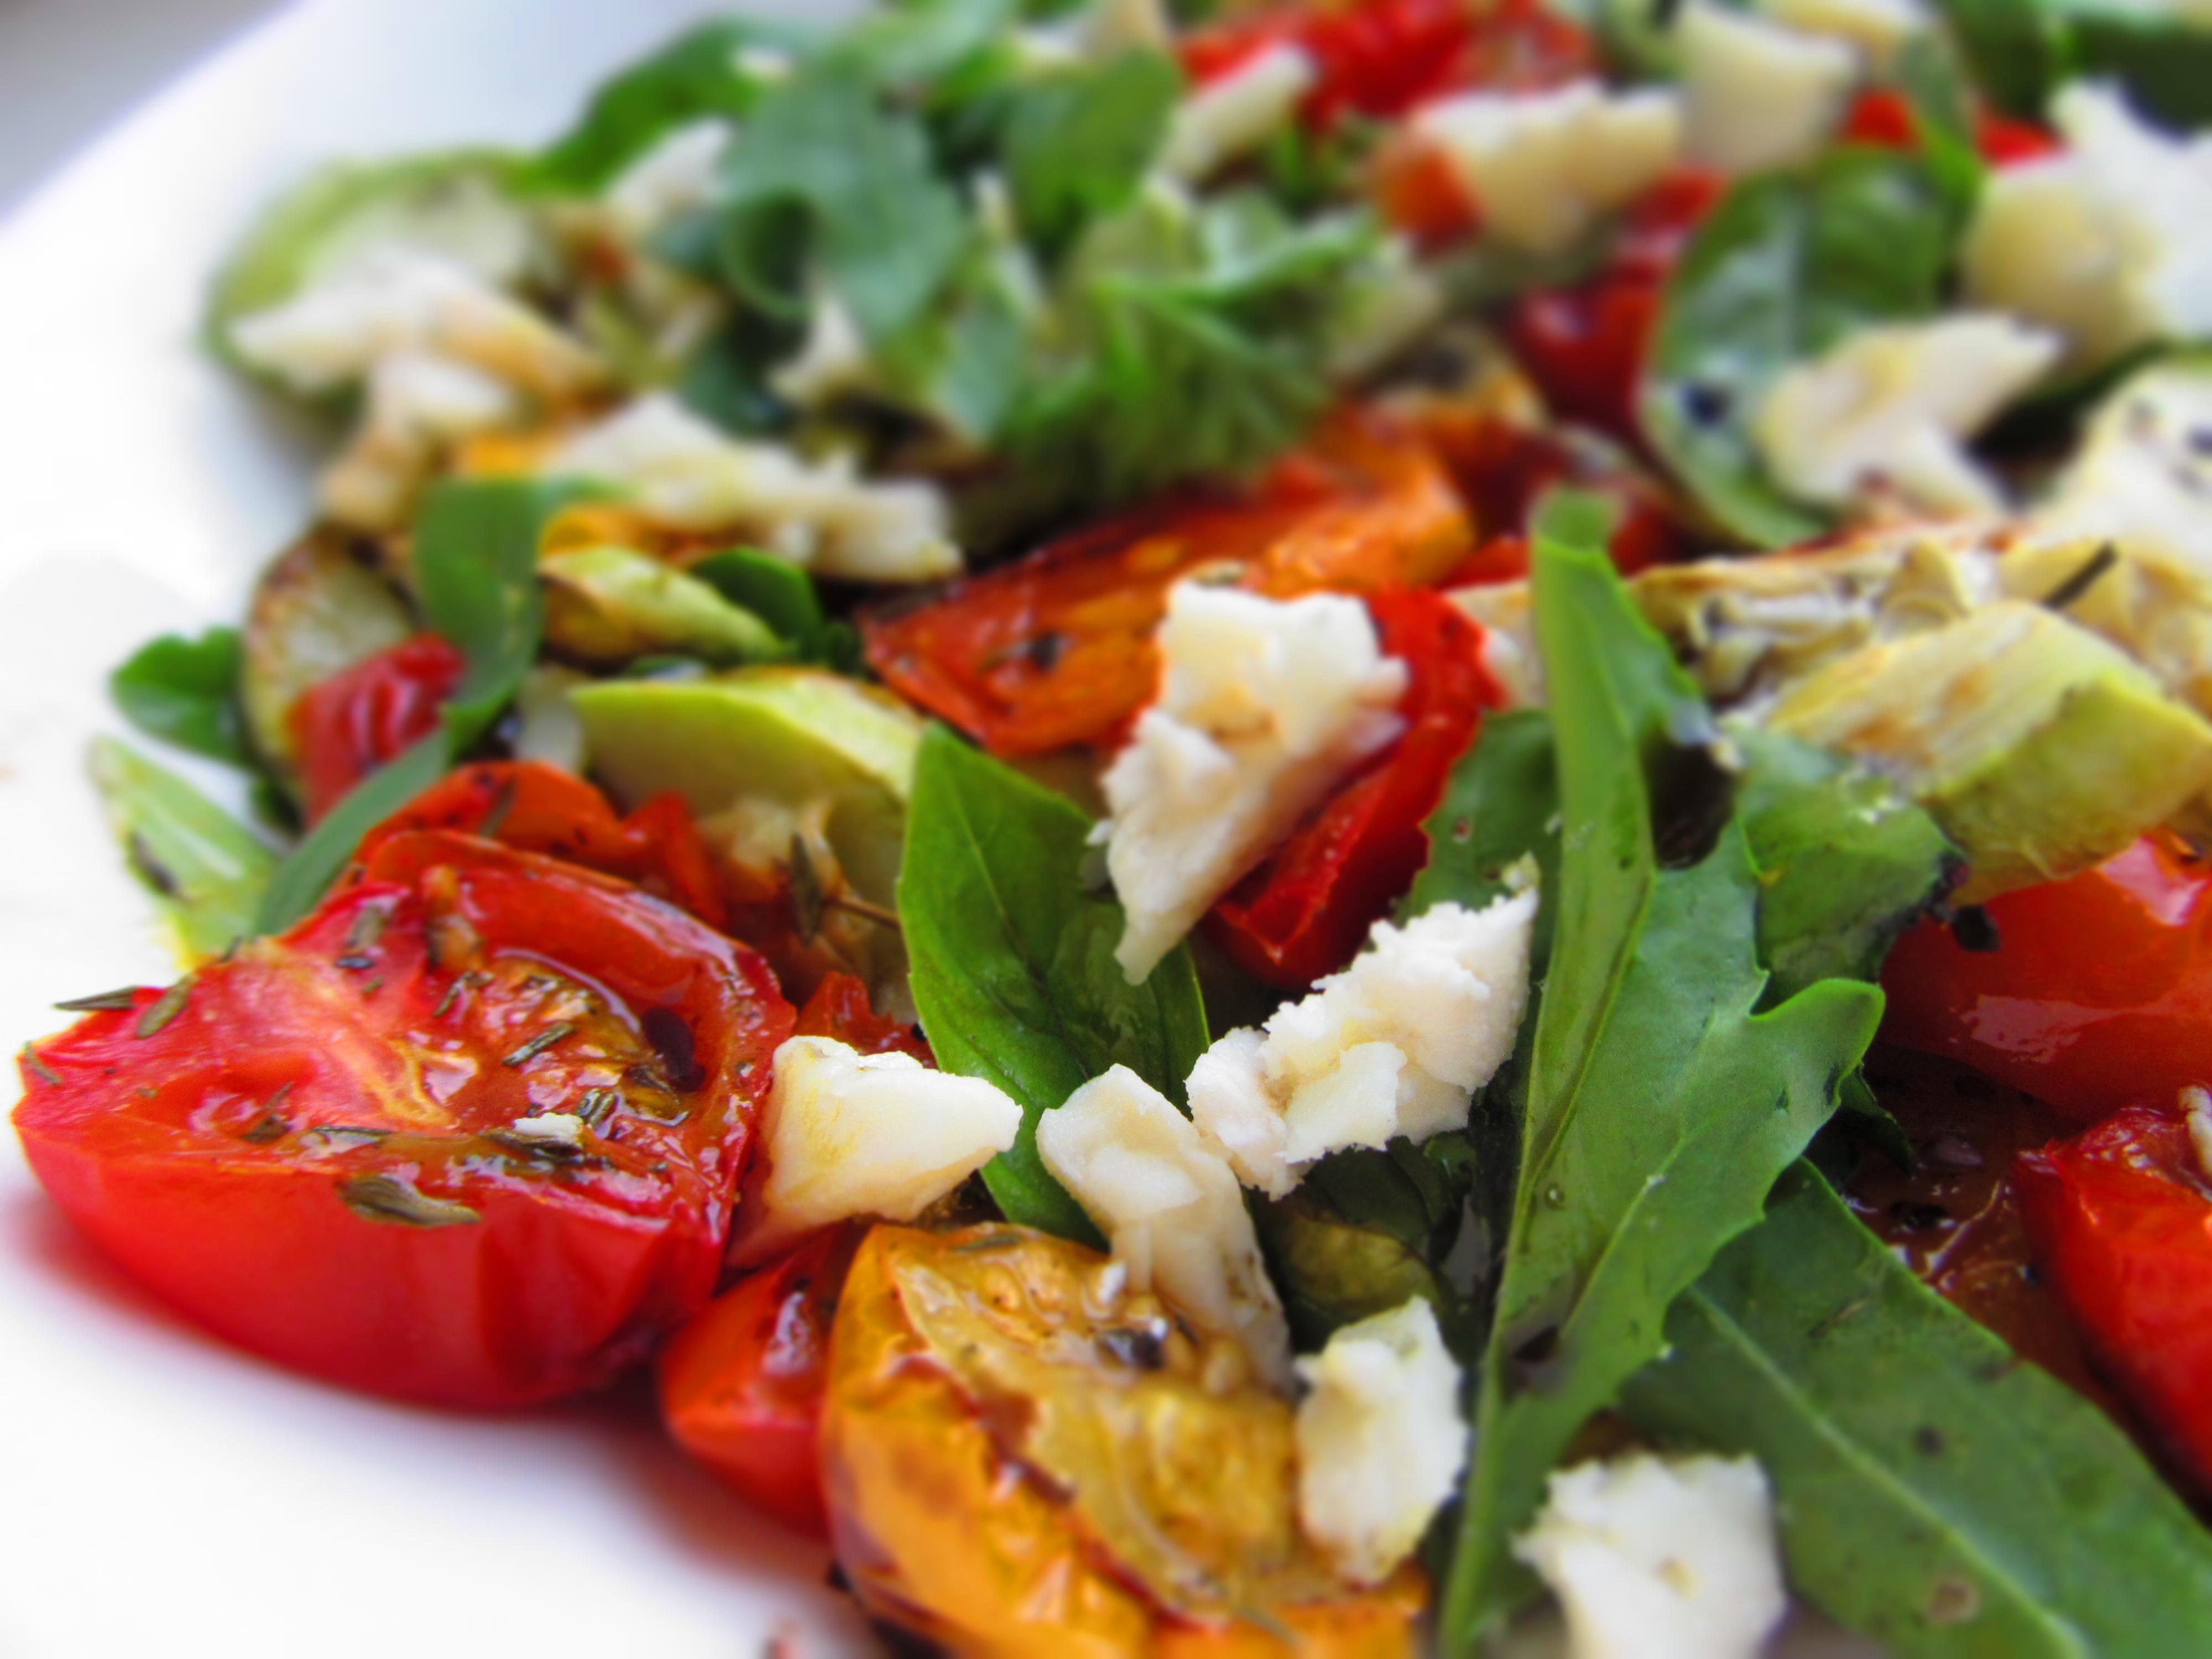 Grilētu tomātu un cukini salāti